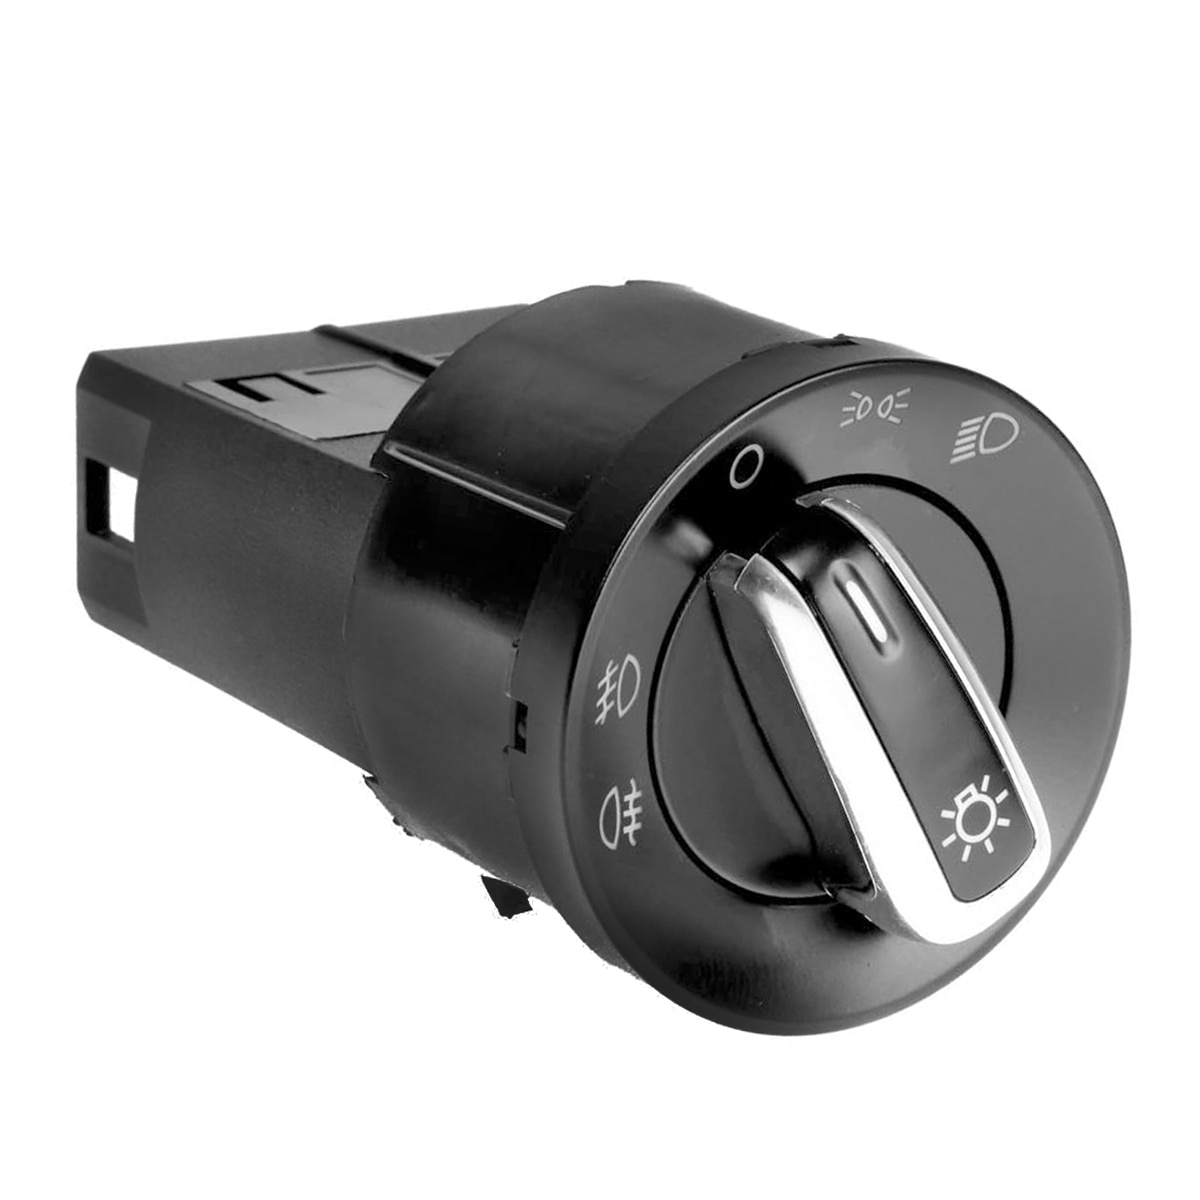 Faro interruptor de Control para Vw Jetta Bora Golf MK4 Passat B5...